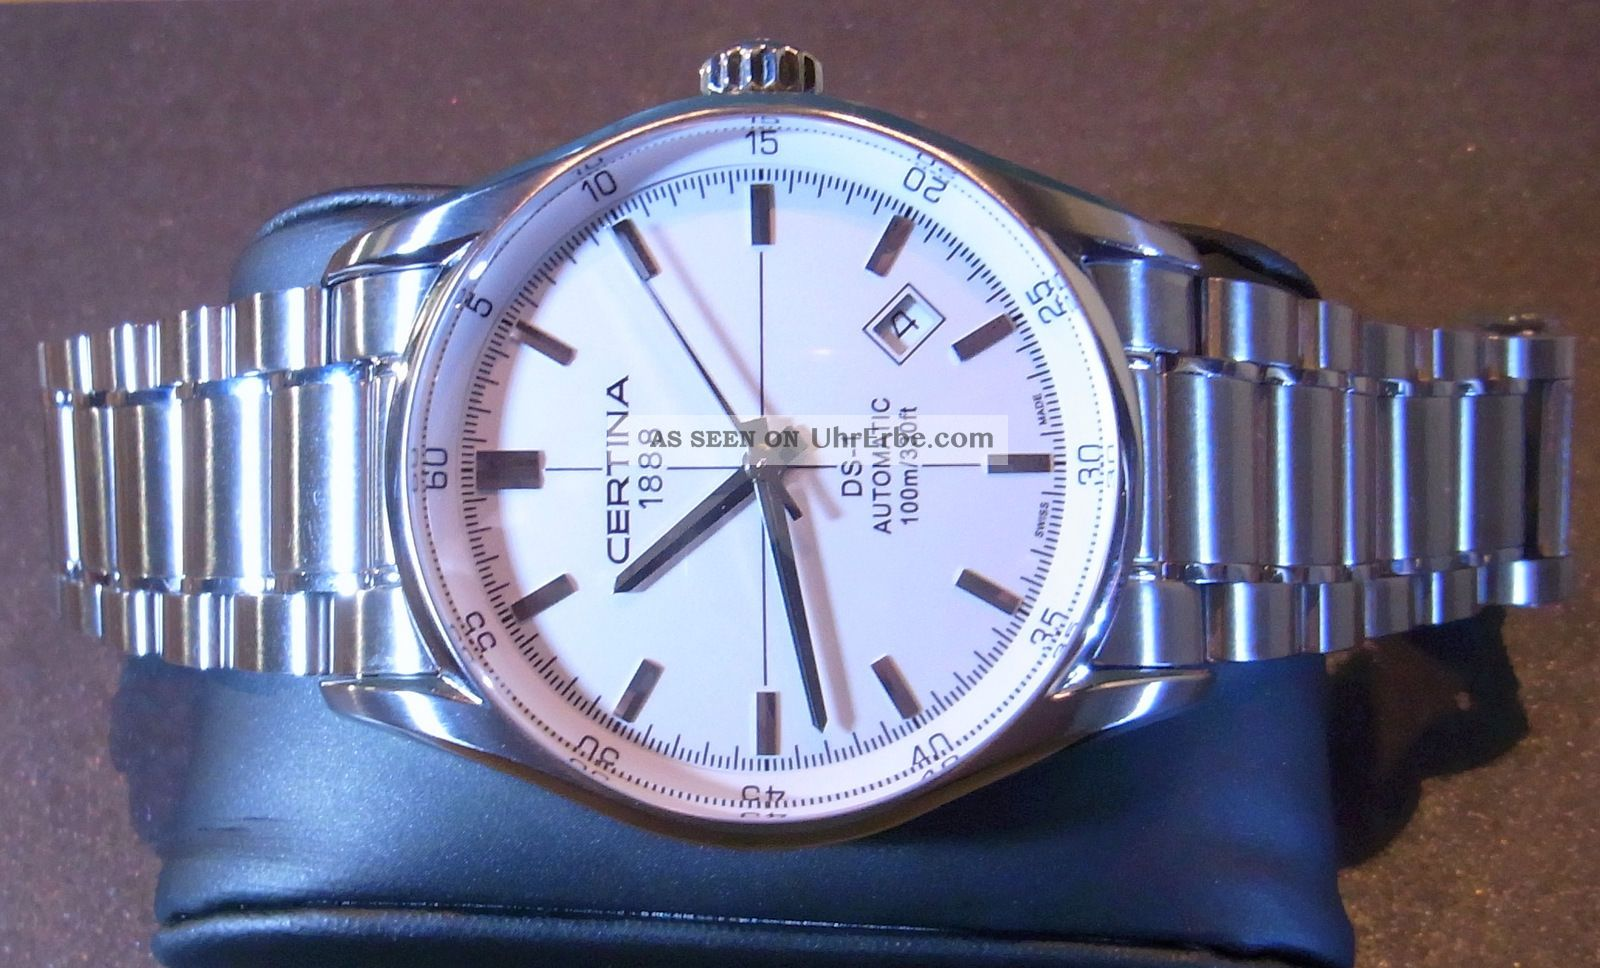 Certina Ds - 1 Automatik Uhr 1 Tag Alt Absolut Neuwertiger Eta 2824 - 2 Armbanduhren Bild